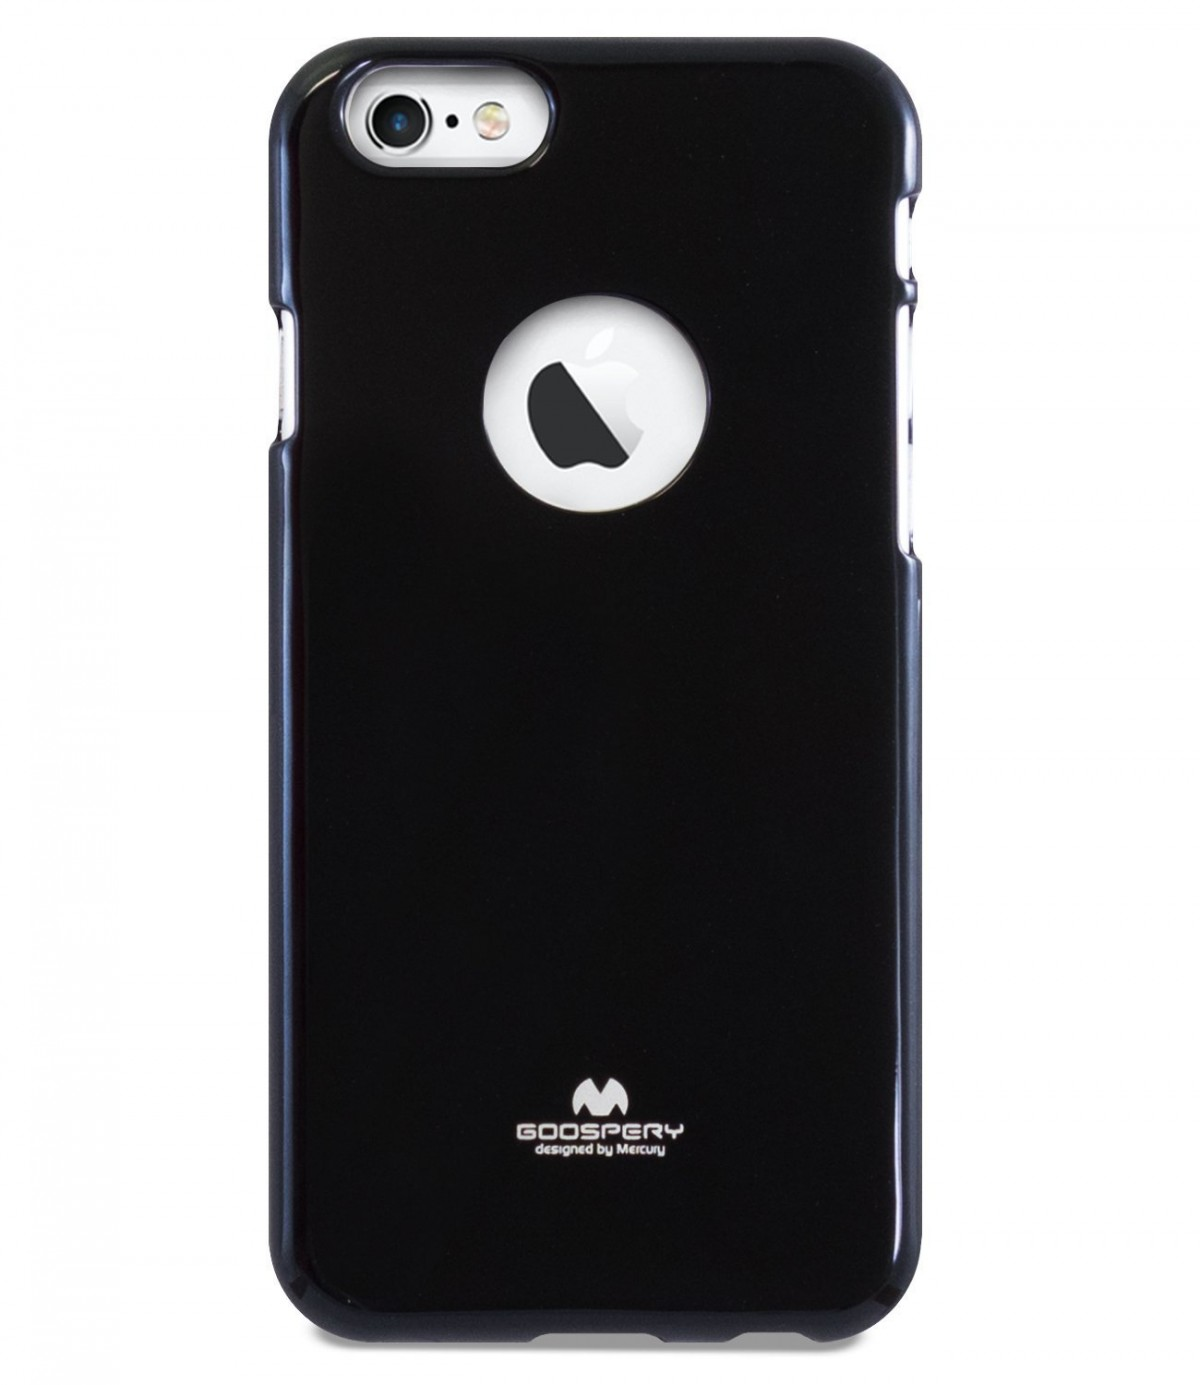 Pouzdro Goospery Mercury Jelly iPhone 6 / iPhone 6s černé